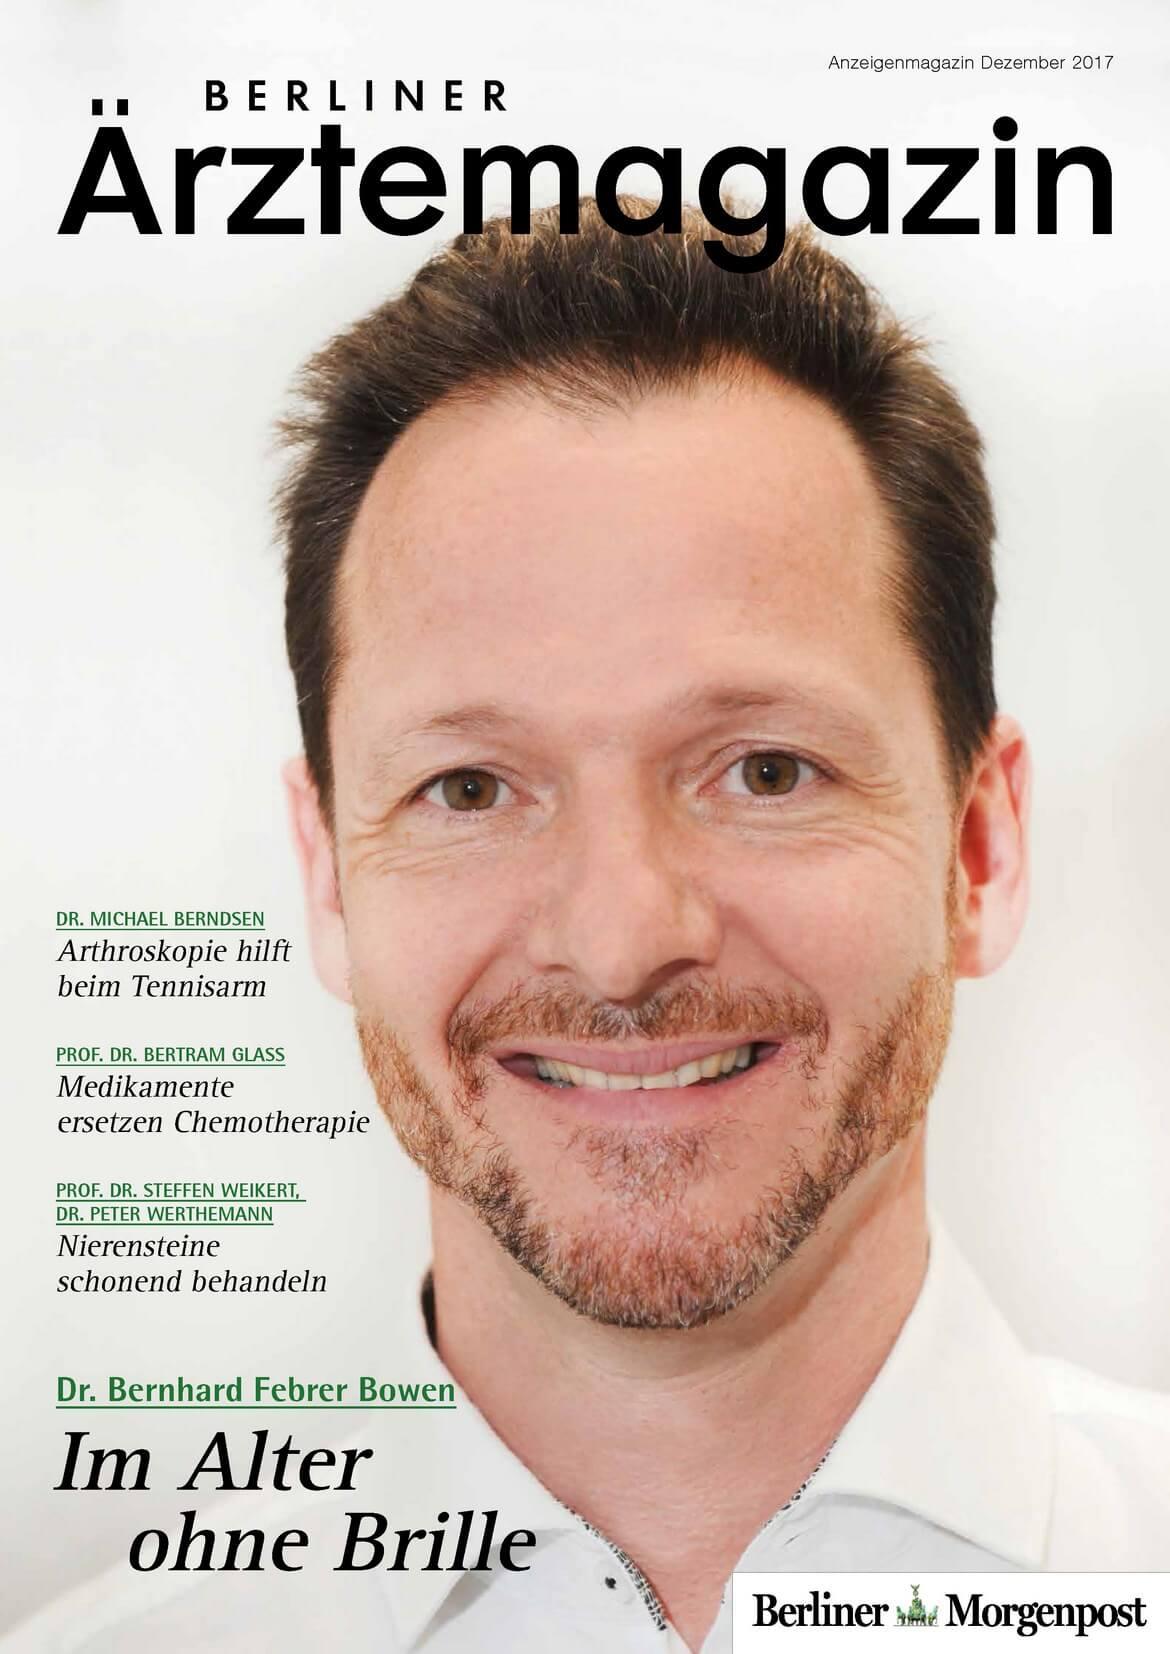 Berliner Ärztemagazin Ausgabe Dezember 2017 erschienen